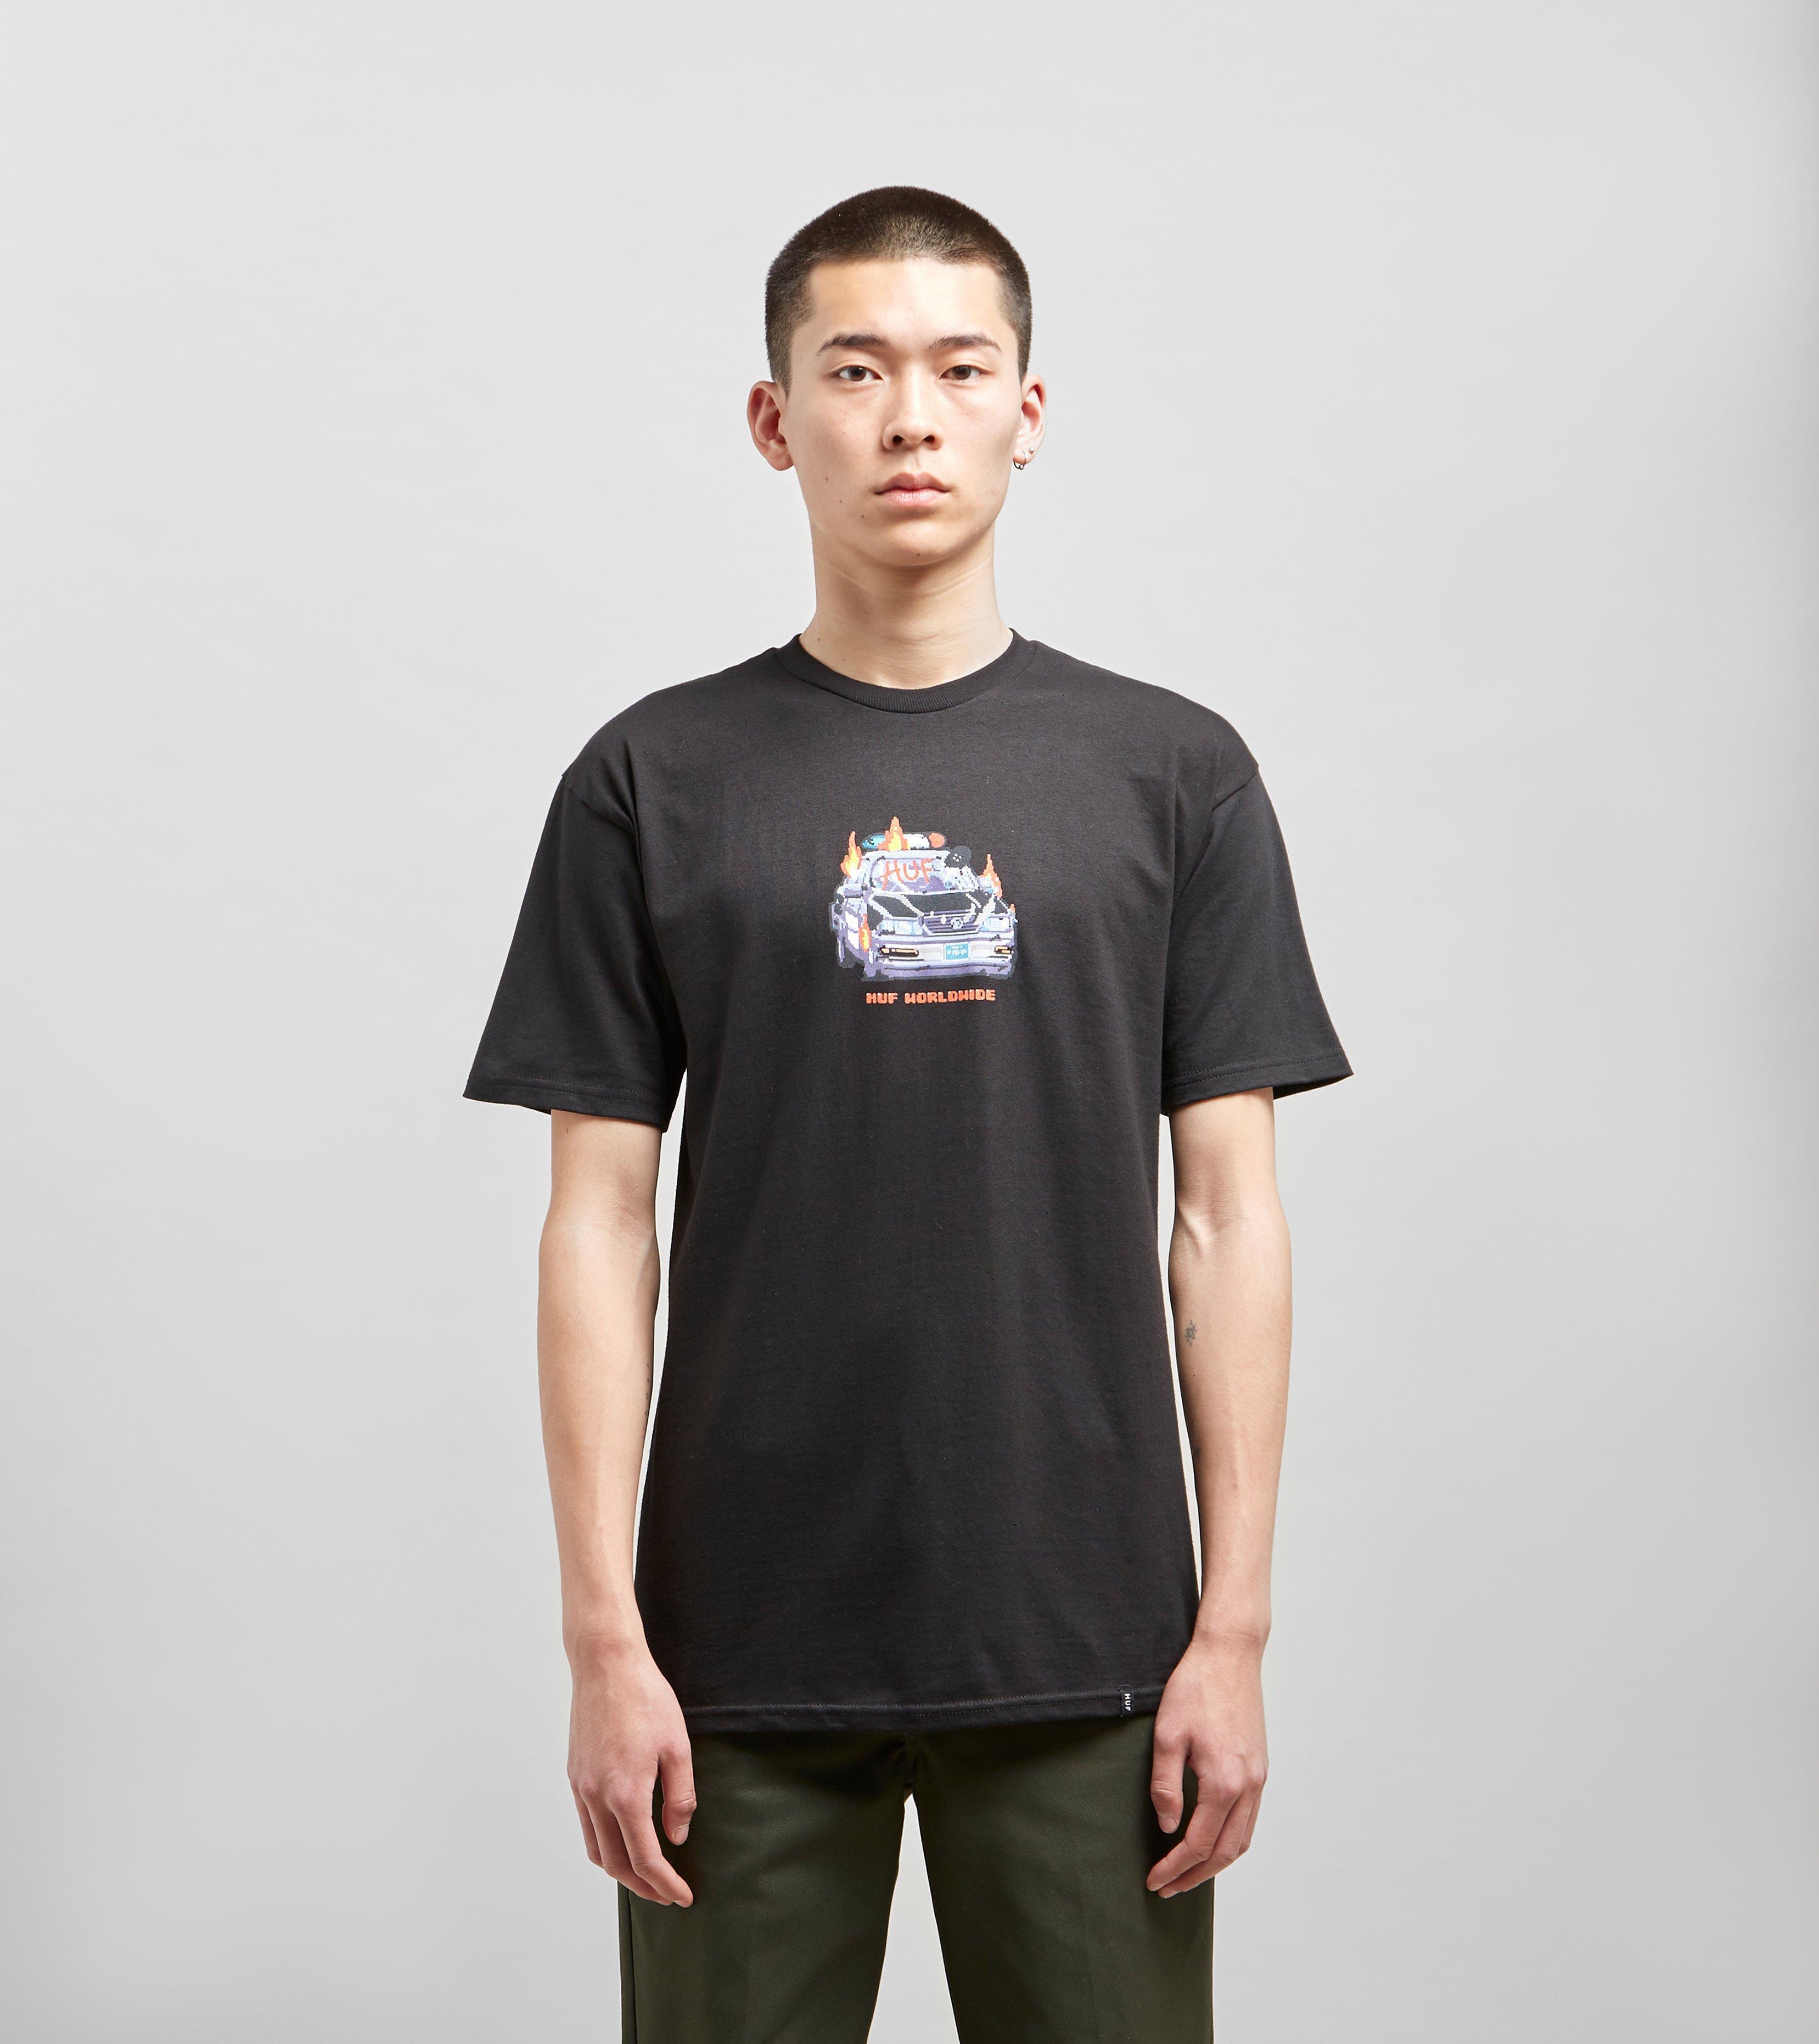 c8551eaf Topman T Shirts Shrink - Cotswold Hire